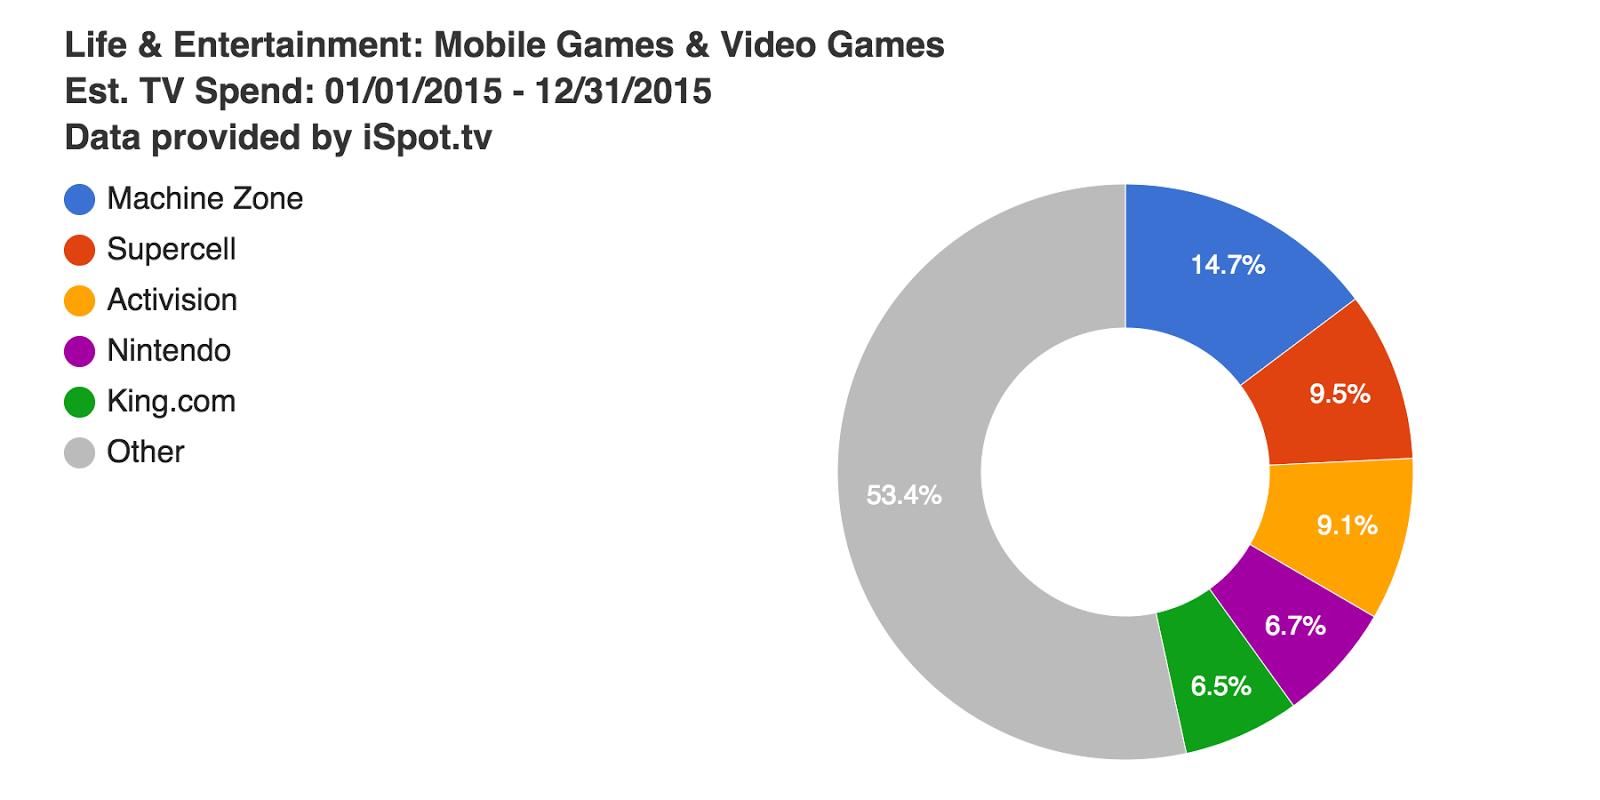 life--entertainment-mobile-games--video-games-est-tv-spend-01-01-2015--12-31-2015